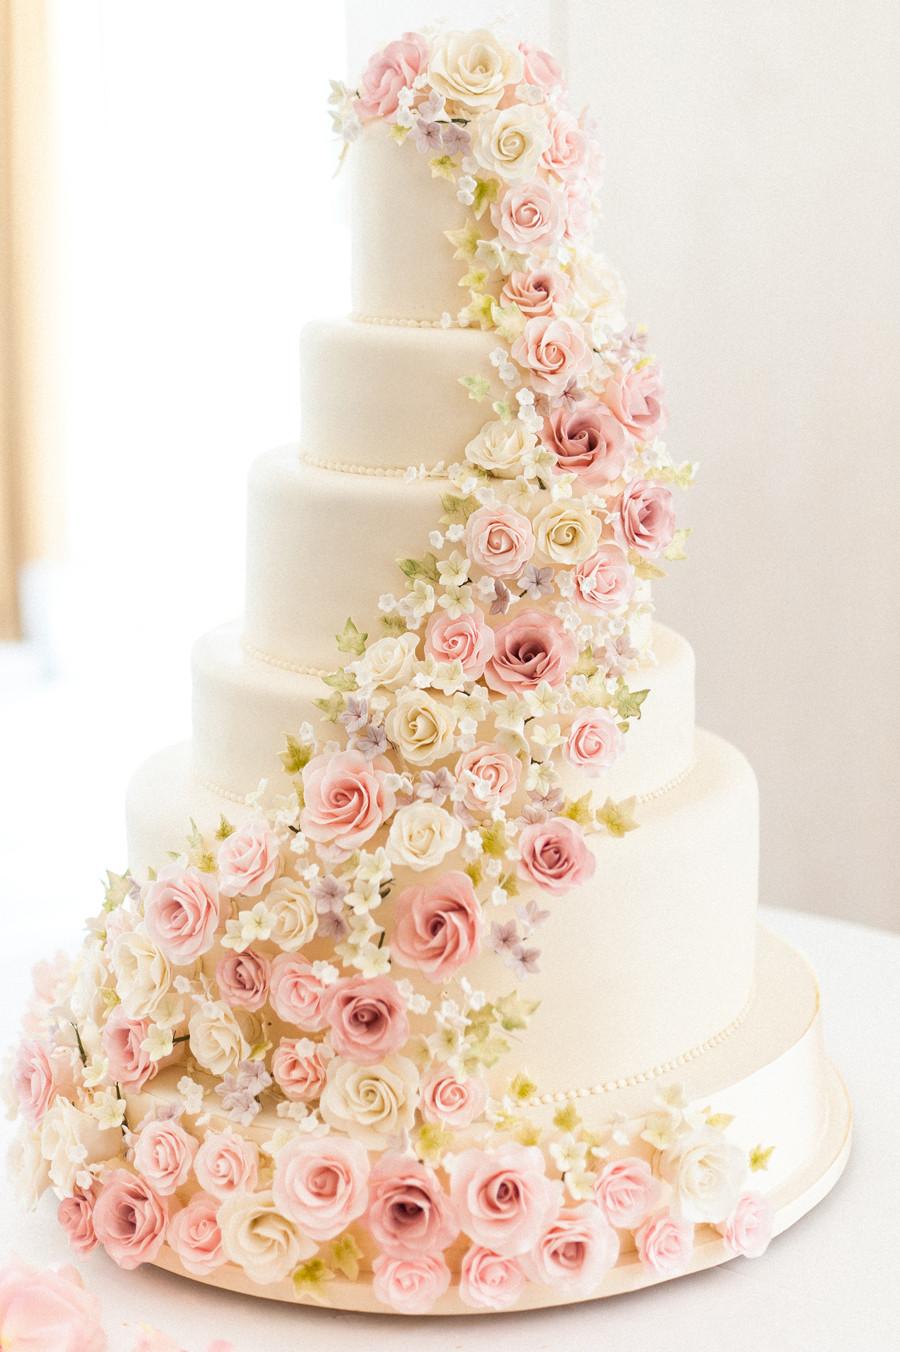 Wedding Birthday Cake  Order line Best quality of Eggless Birthday wedding and